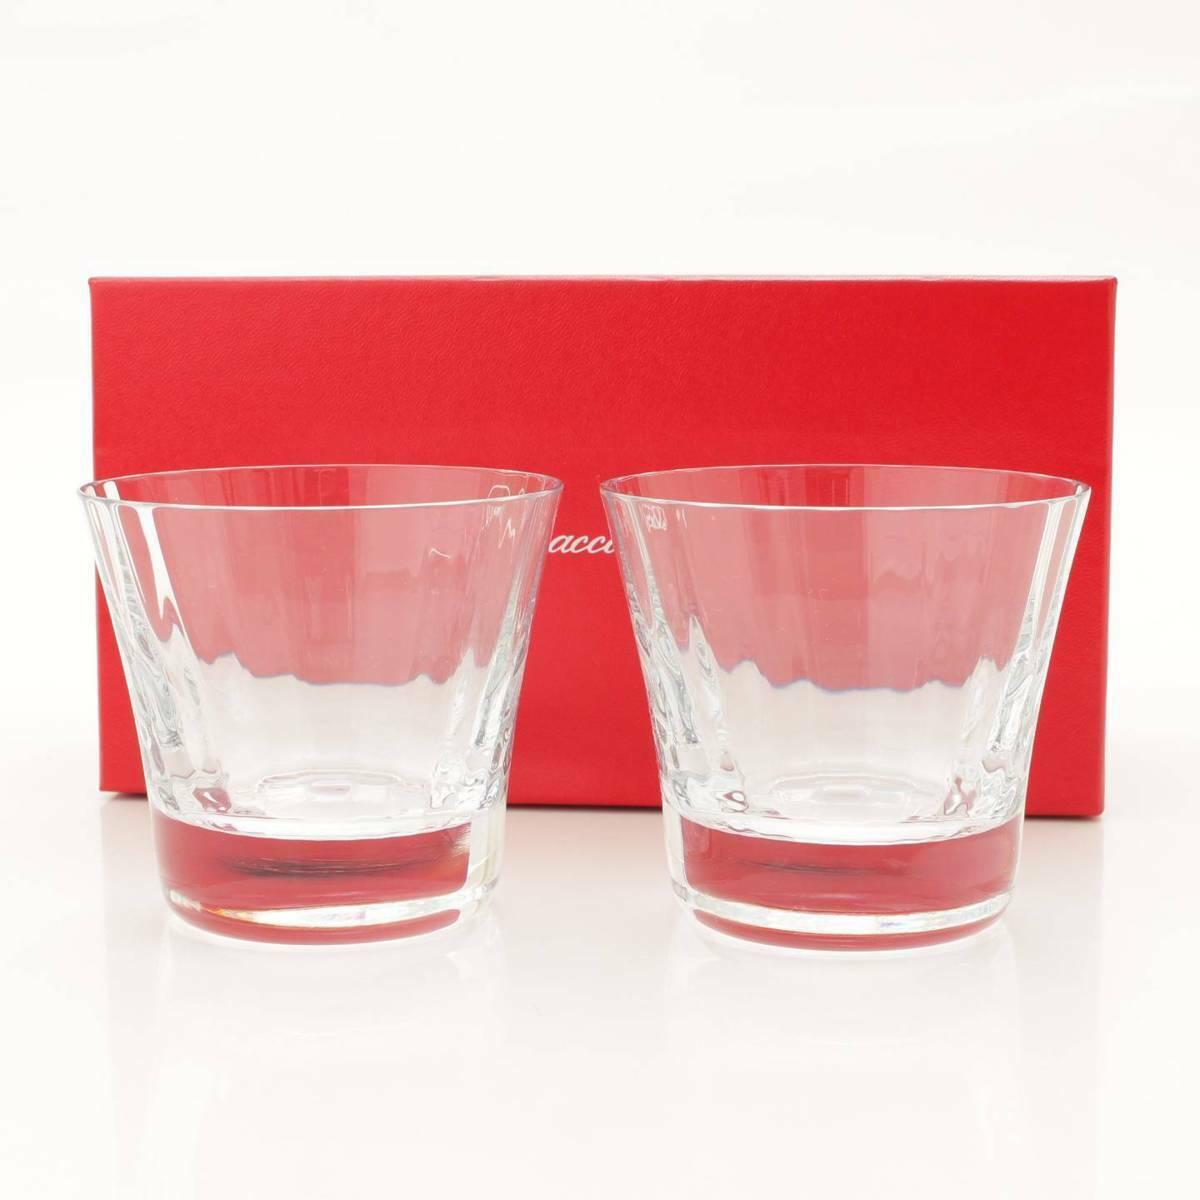 Auth BACCARAT Milny Rock Glass Tumbler 2 Customer Set Tableware (124442